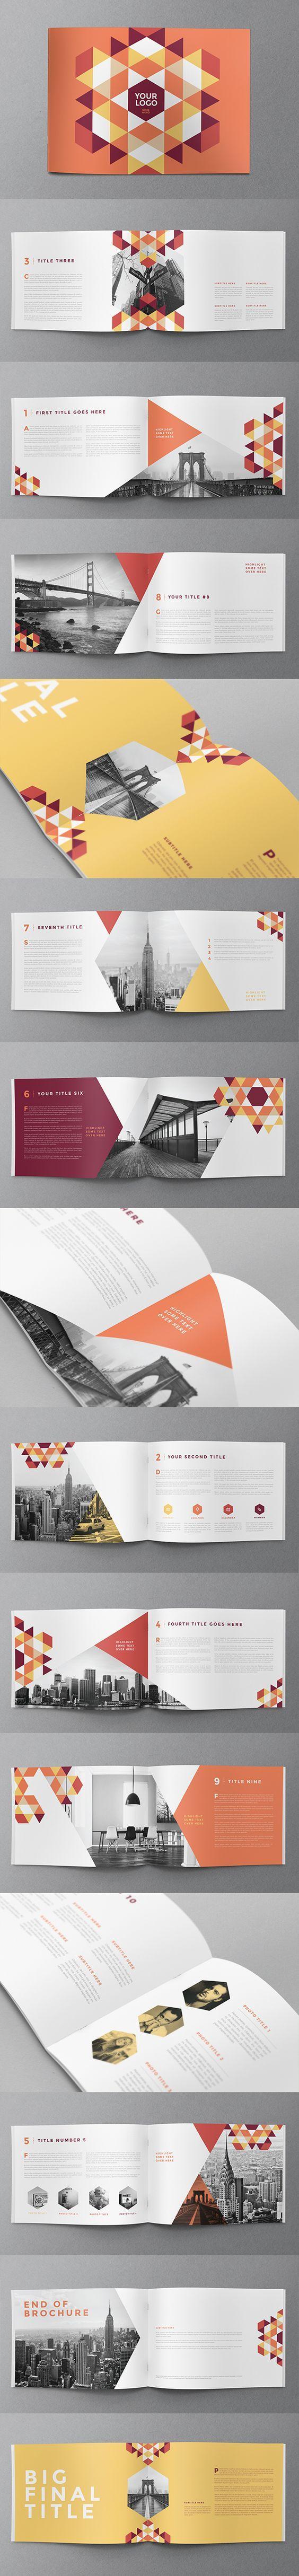 Modern Red Pattern Brochure. Download here: http://graphicriver.net/item/modern-red-pattern-brochure/11973823?ref=abradesign #brochure #design #layout: